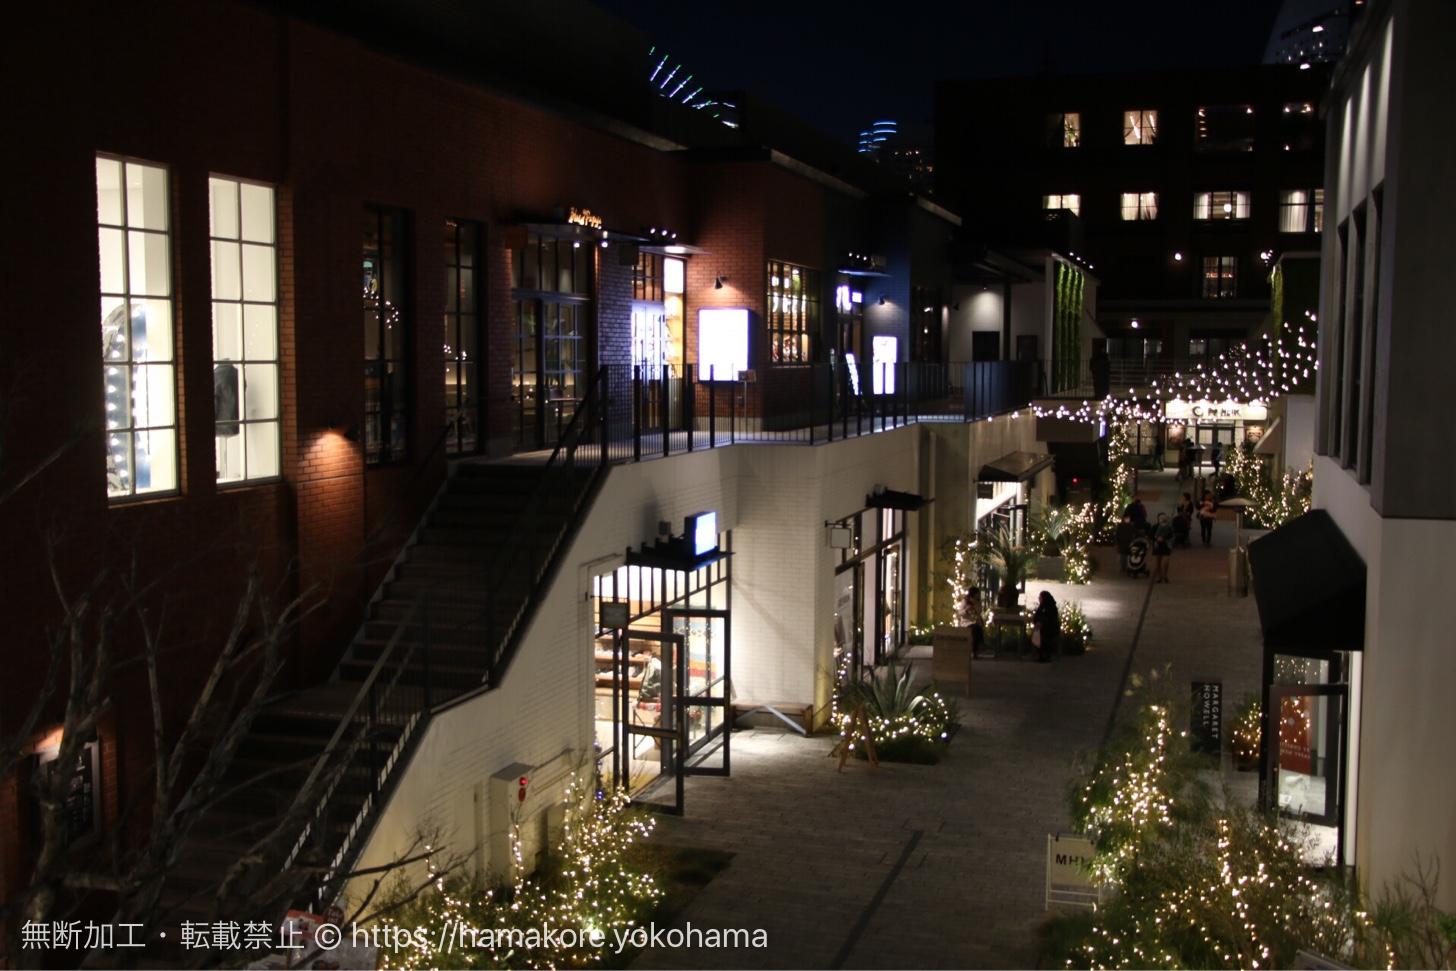 MARINE & WALK YOKOHAMA クリスマスイルミネーション